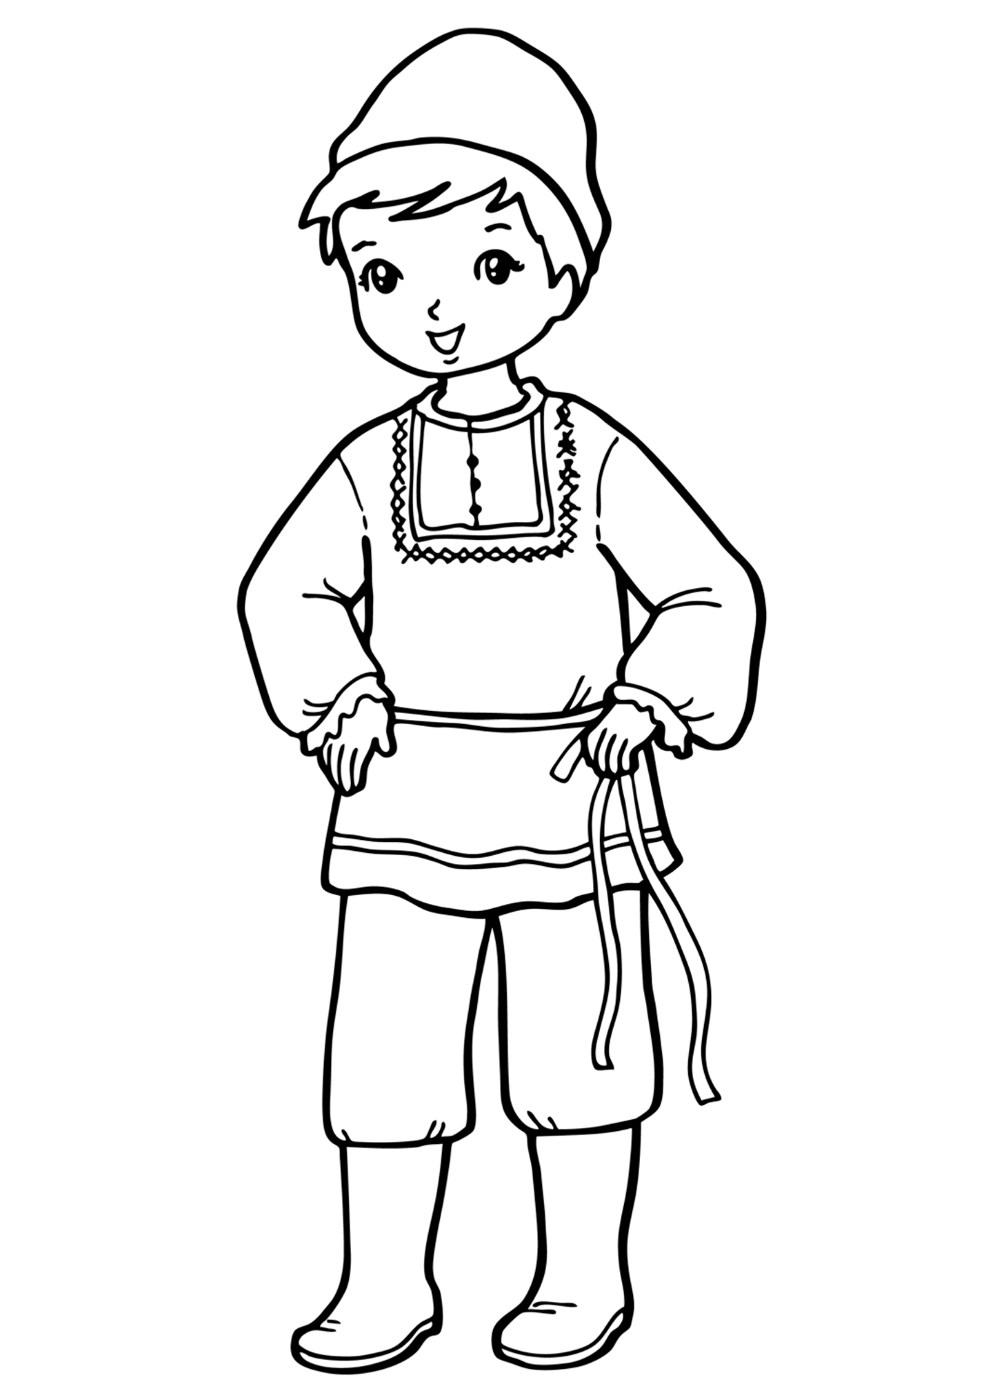 Раскраски куклы мальчики - 7